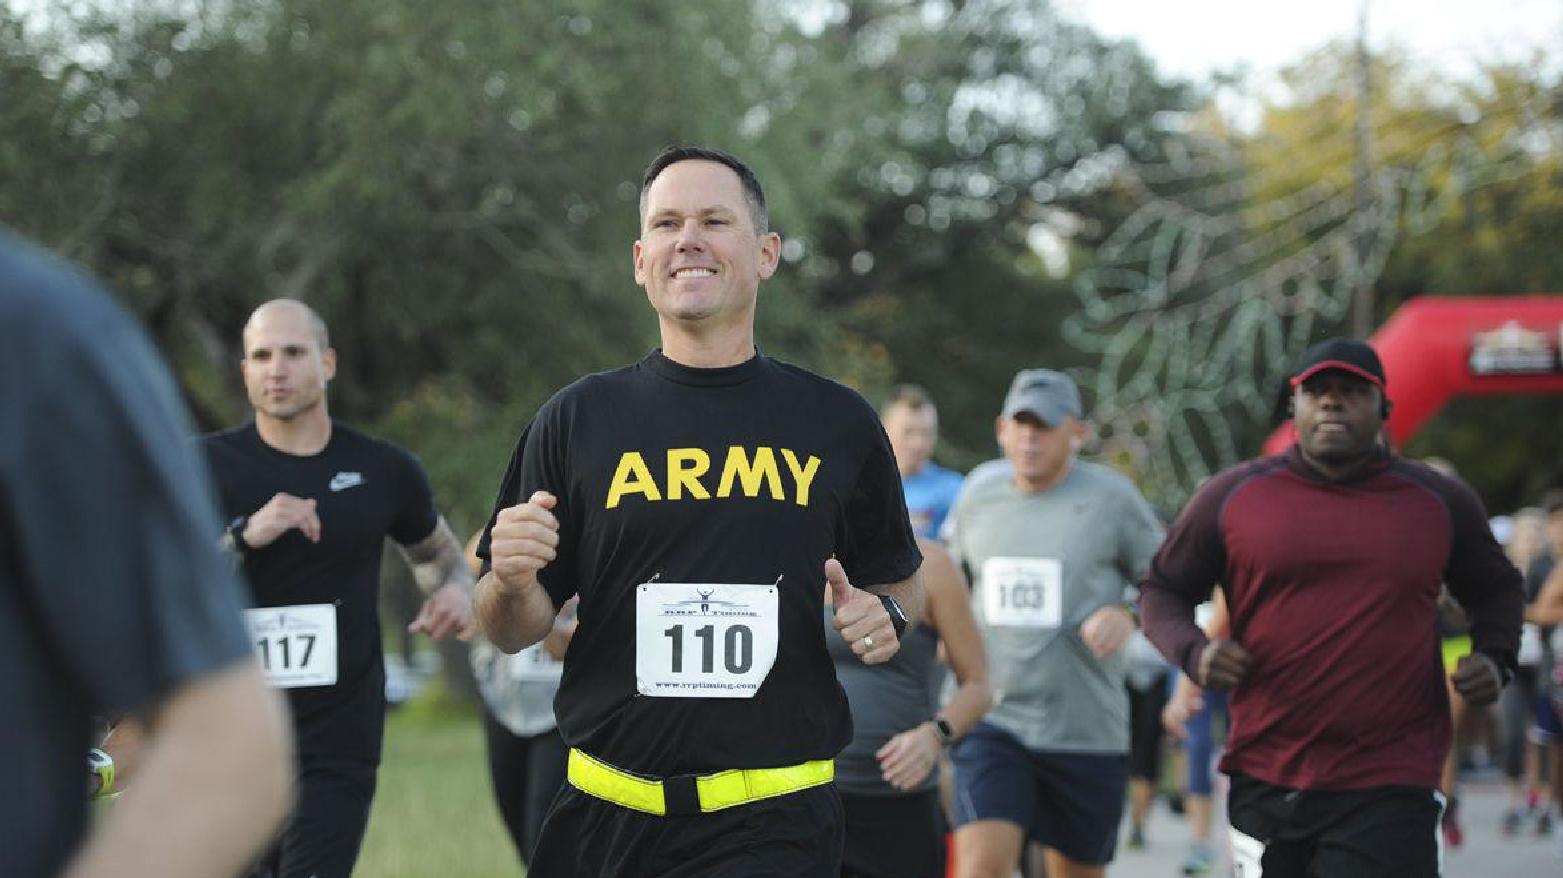 Army 10-miler Qualifier